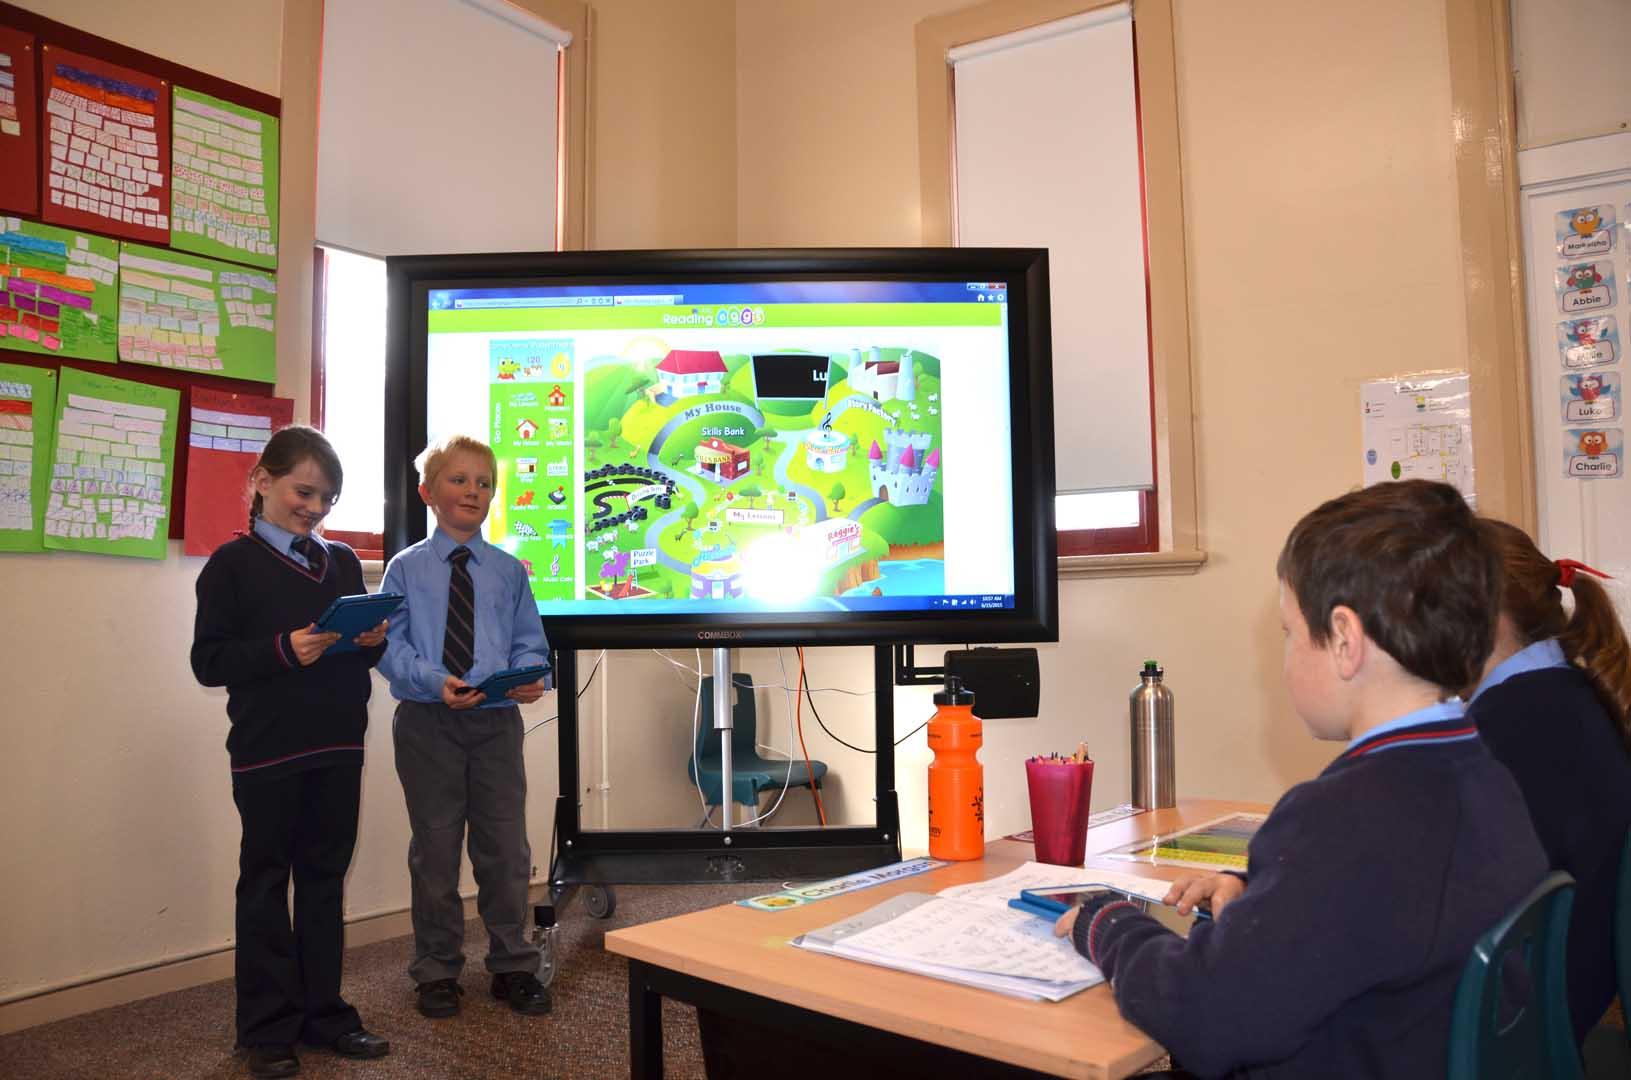 St-Patricks-walcha-student-presentation